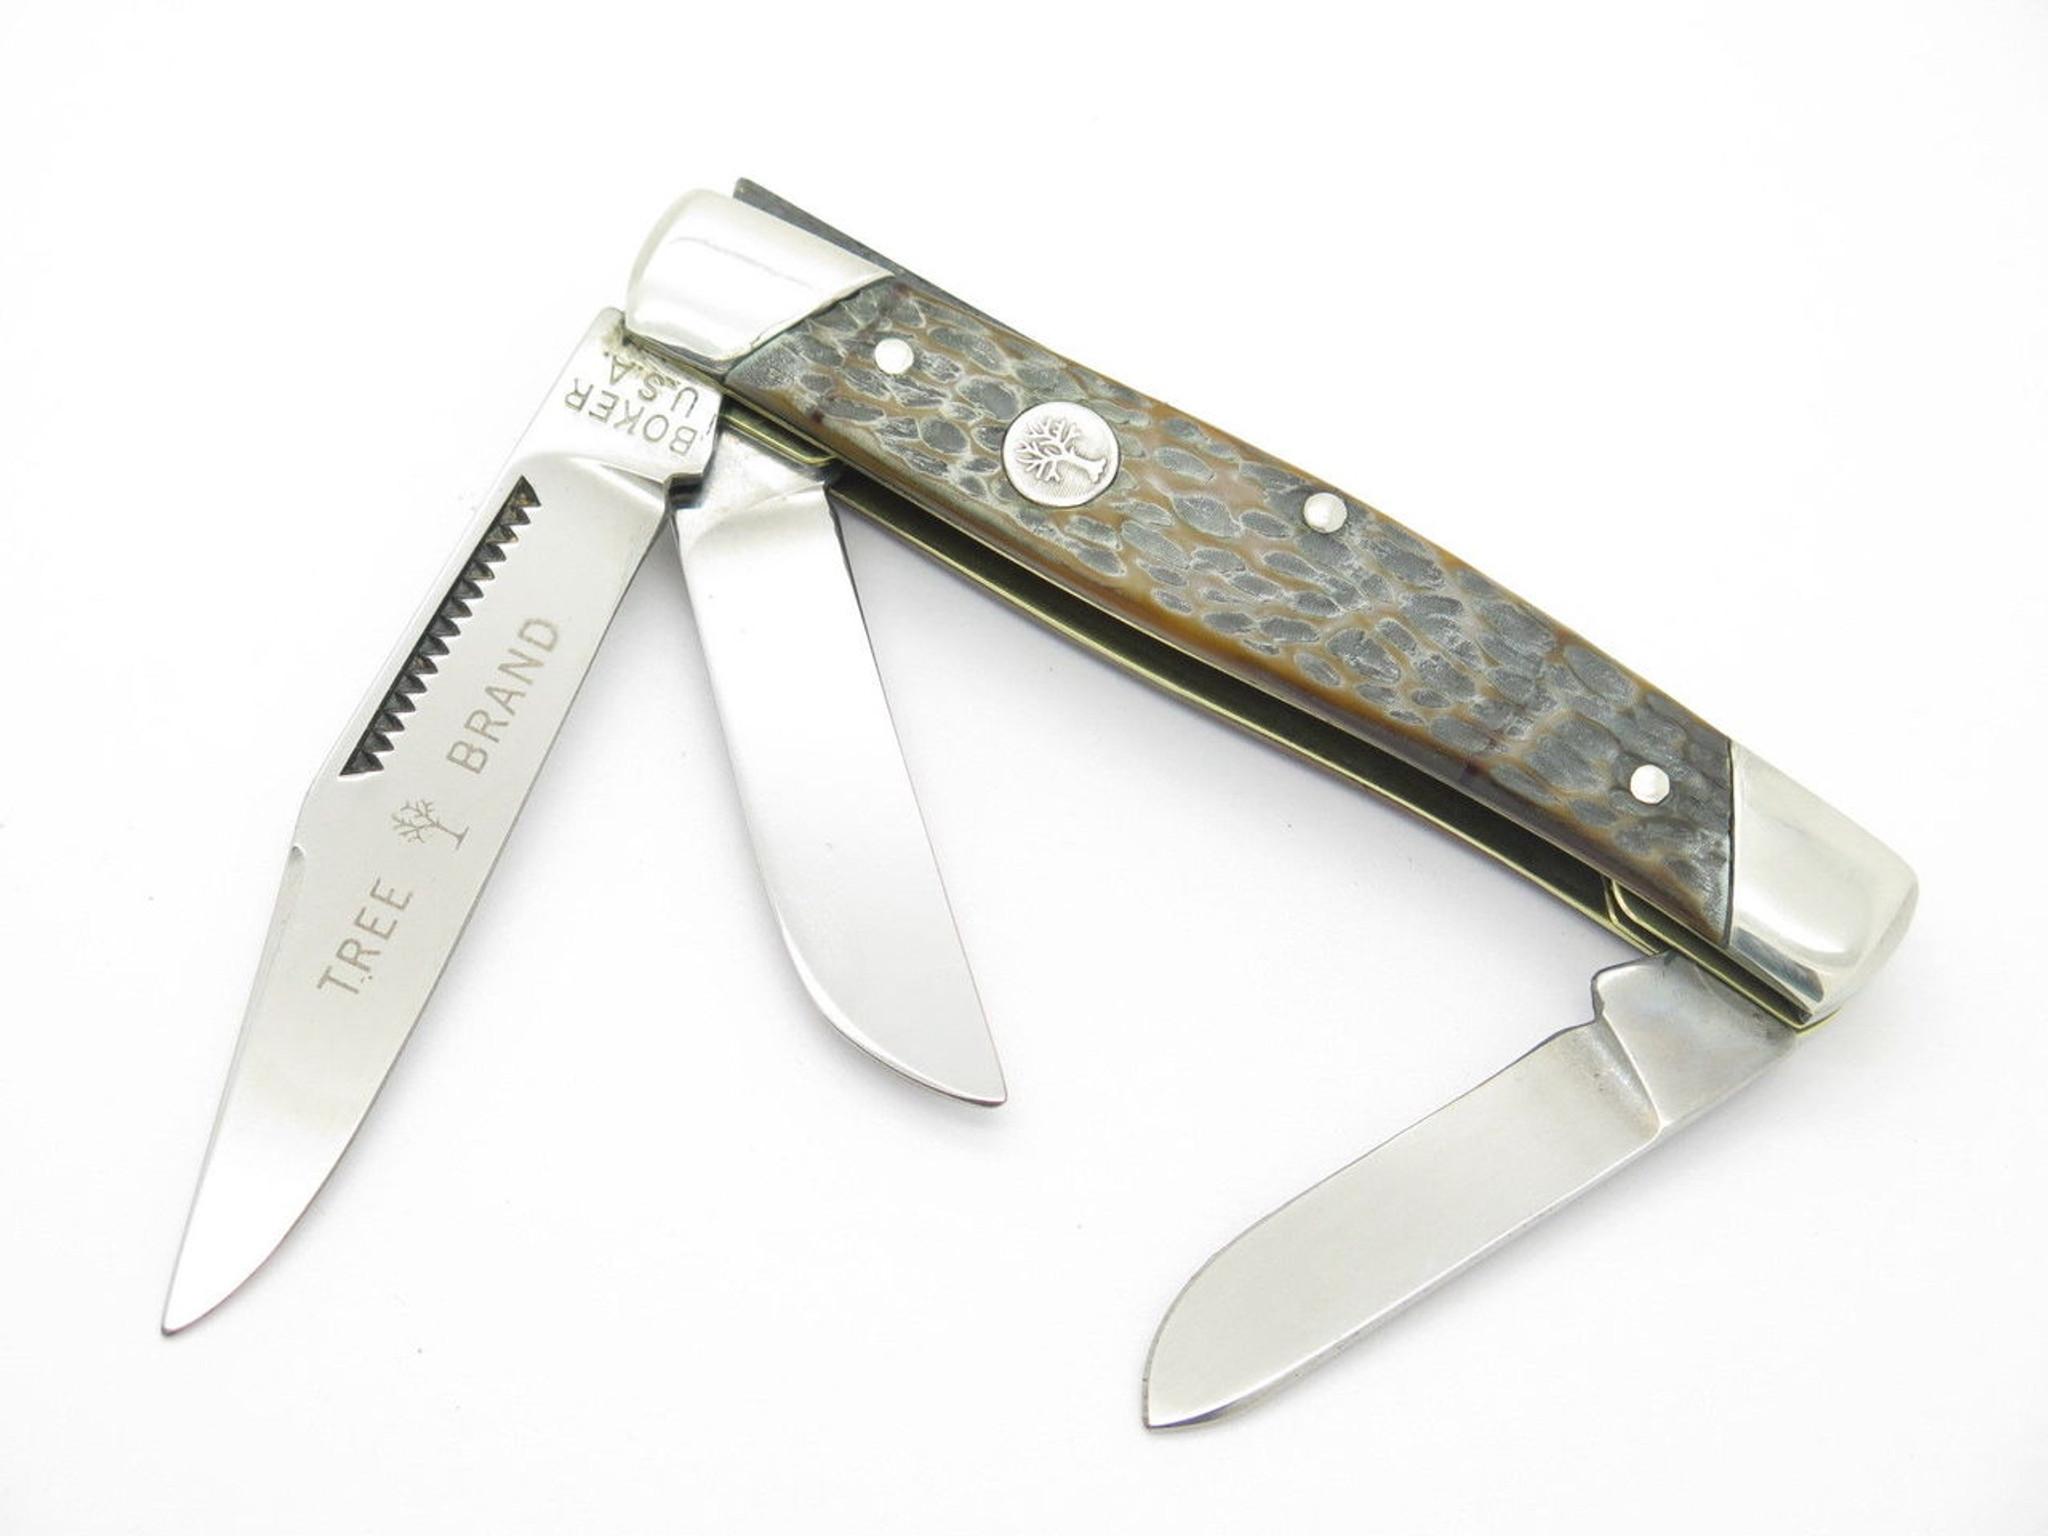 vintage 1970s boker usa tree brand 9885 3 blade stockman folding